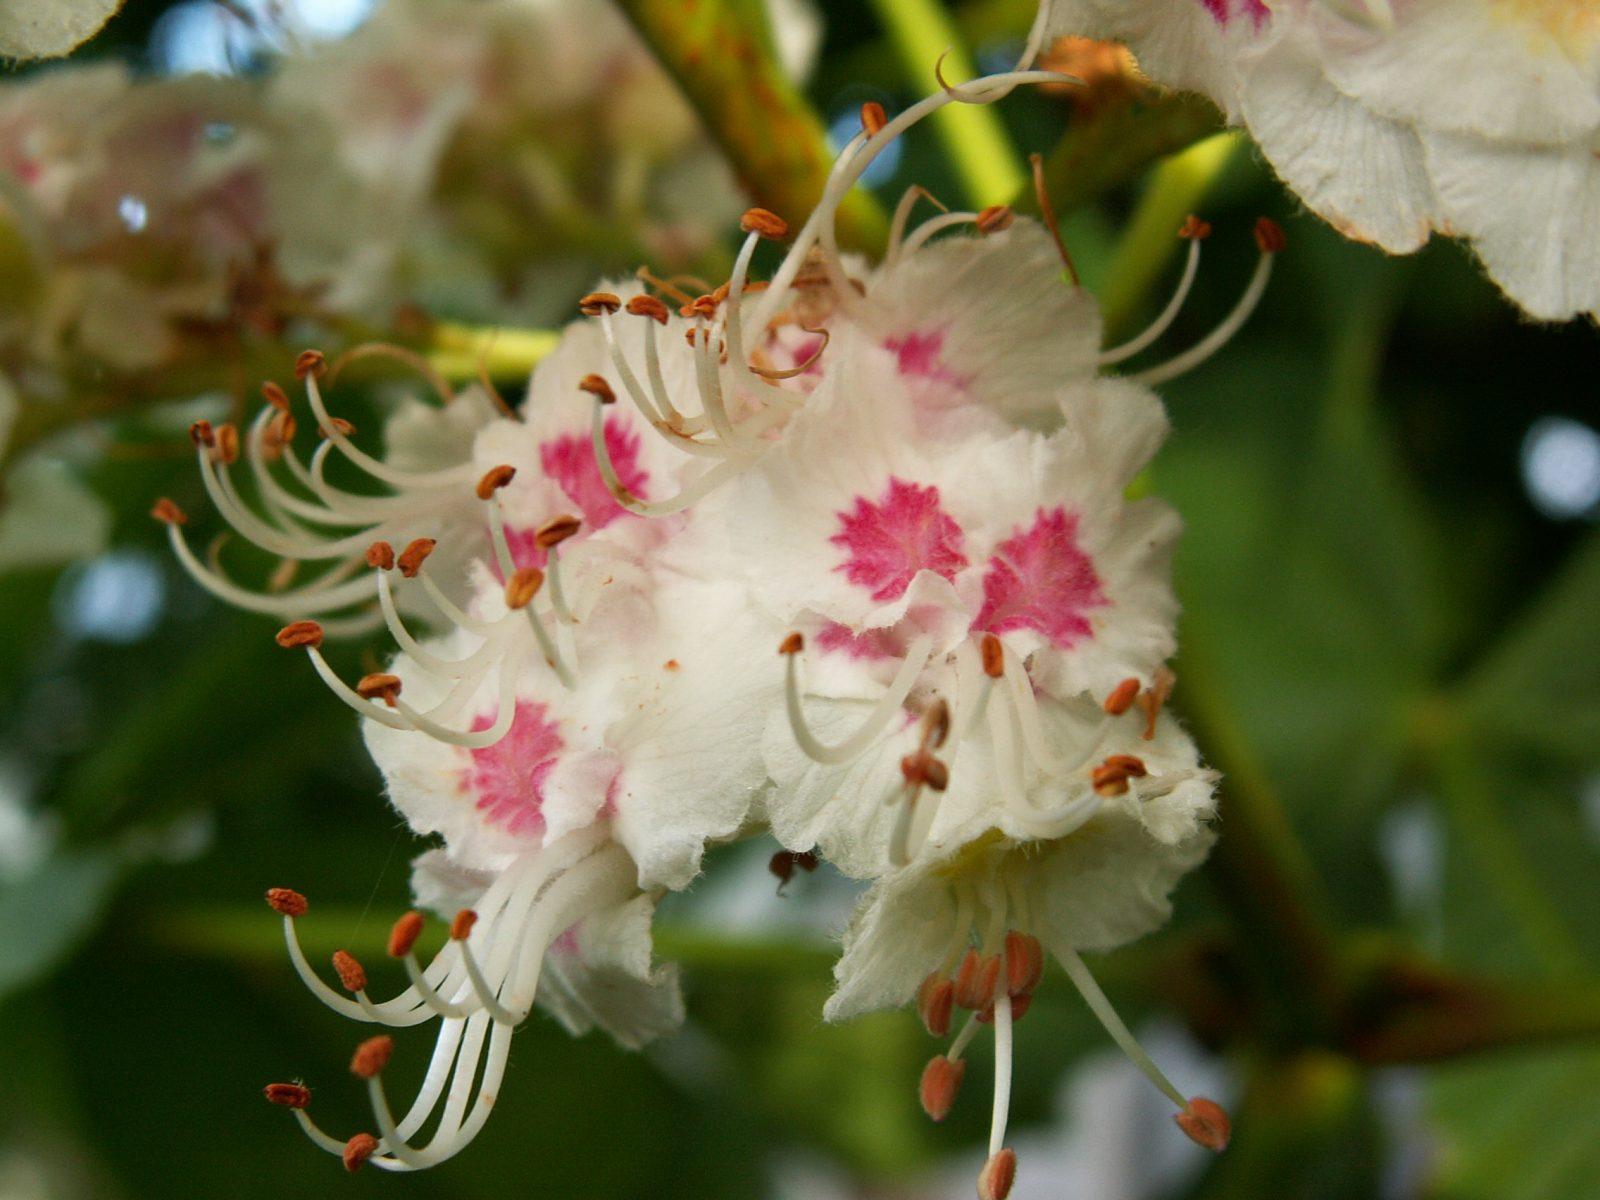 White Chestnut Aesculus Hippocastanum Fiori Di Bach Fiore